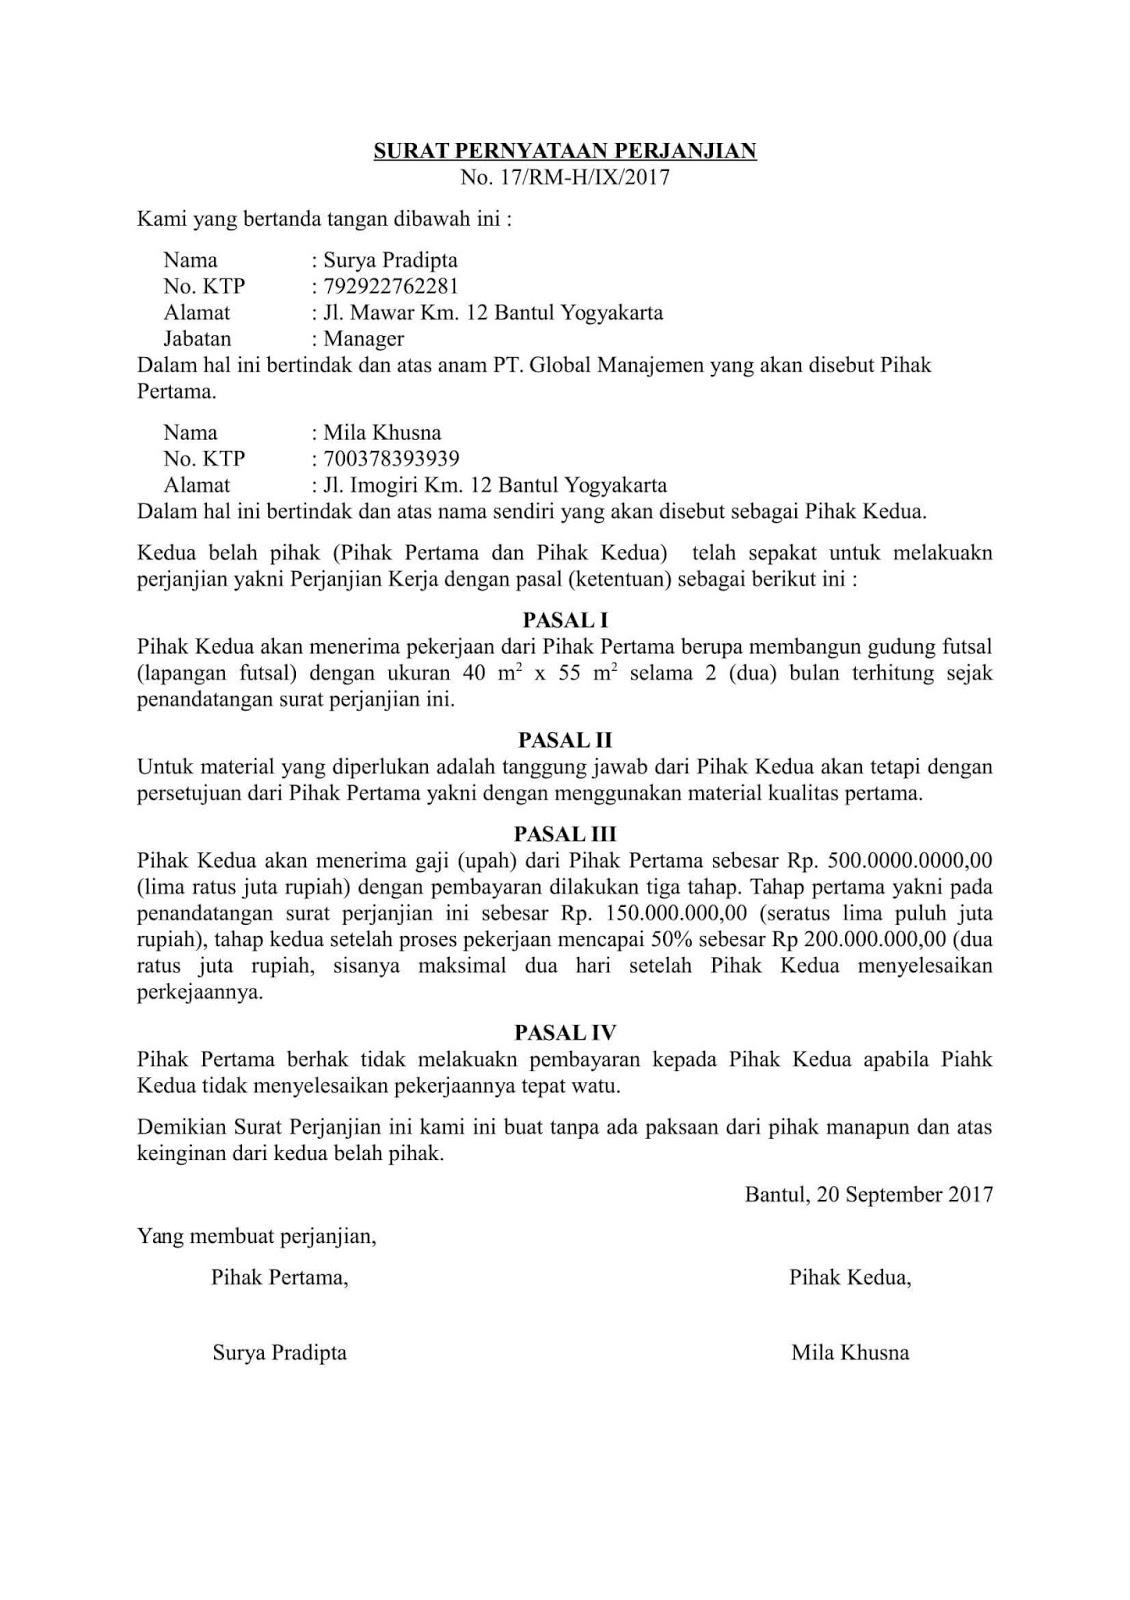 15+ Contoh Surat Pernyataan yang Baik dan Benar Terlengkap ...